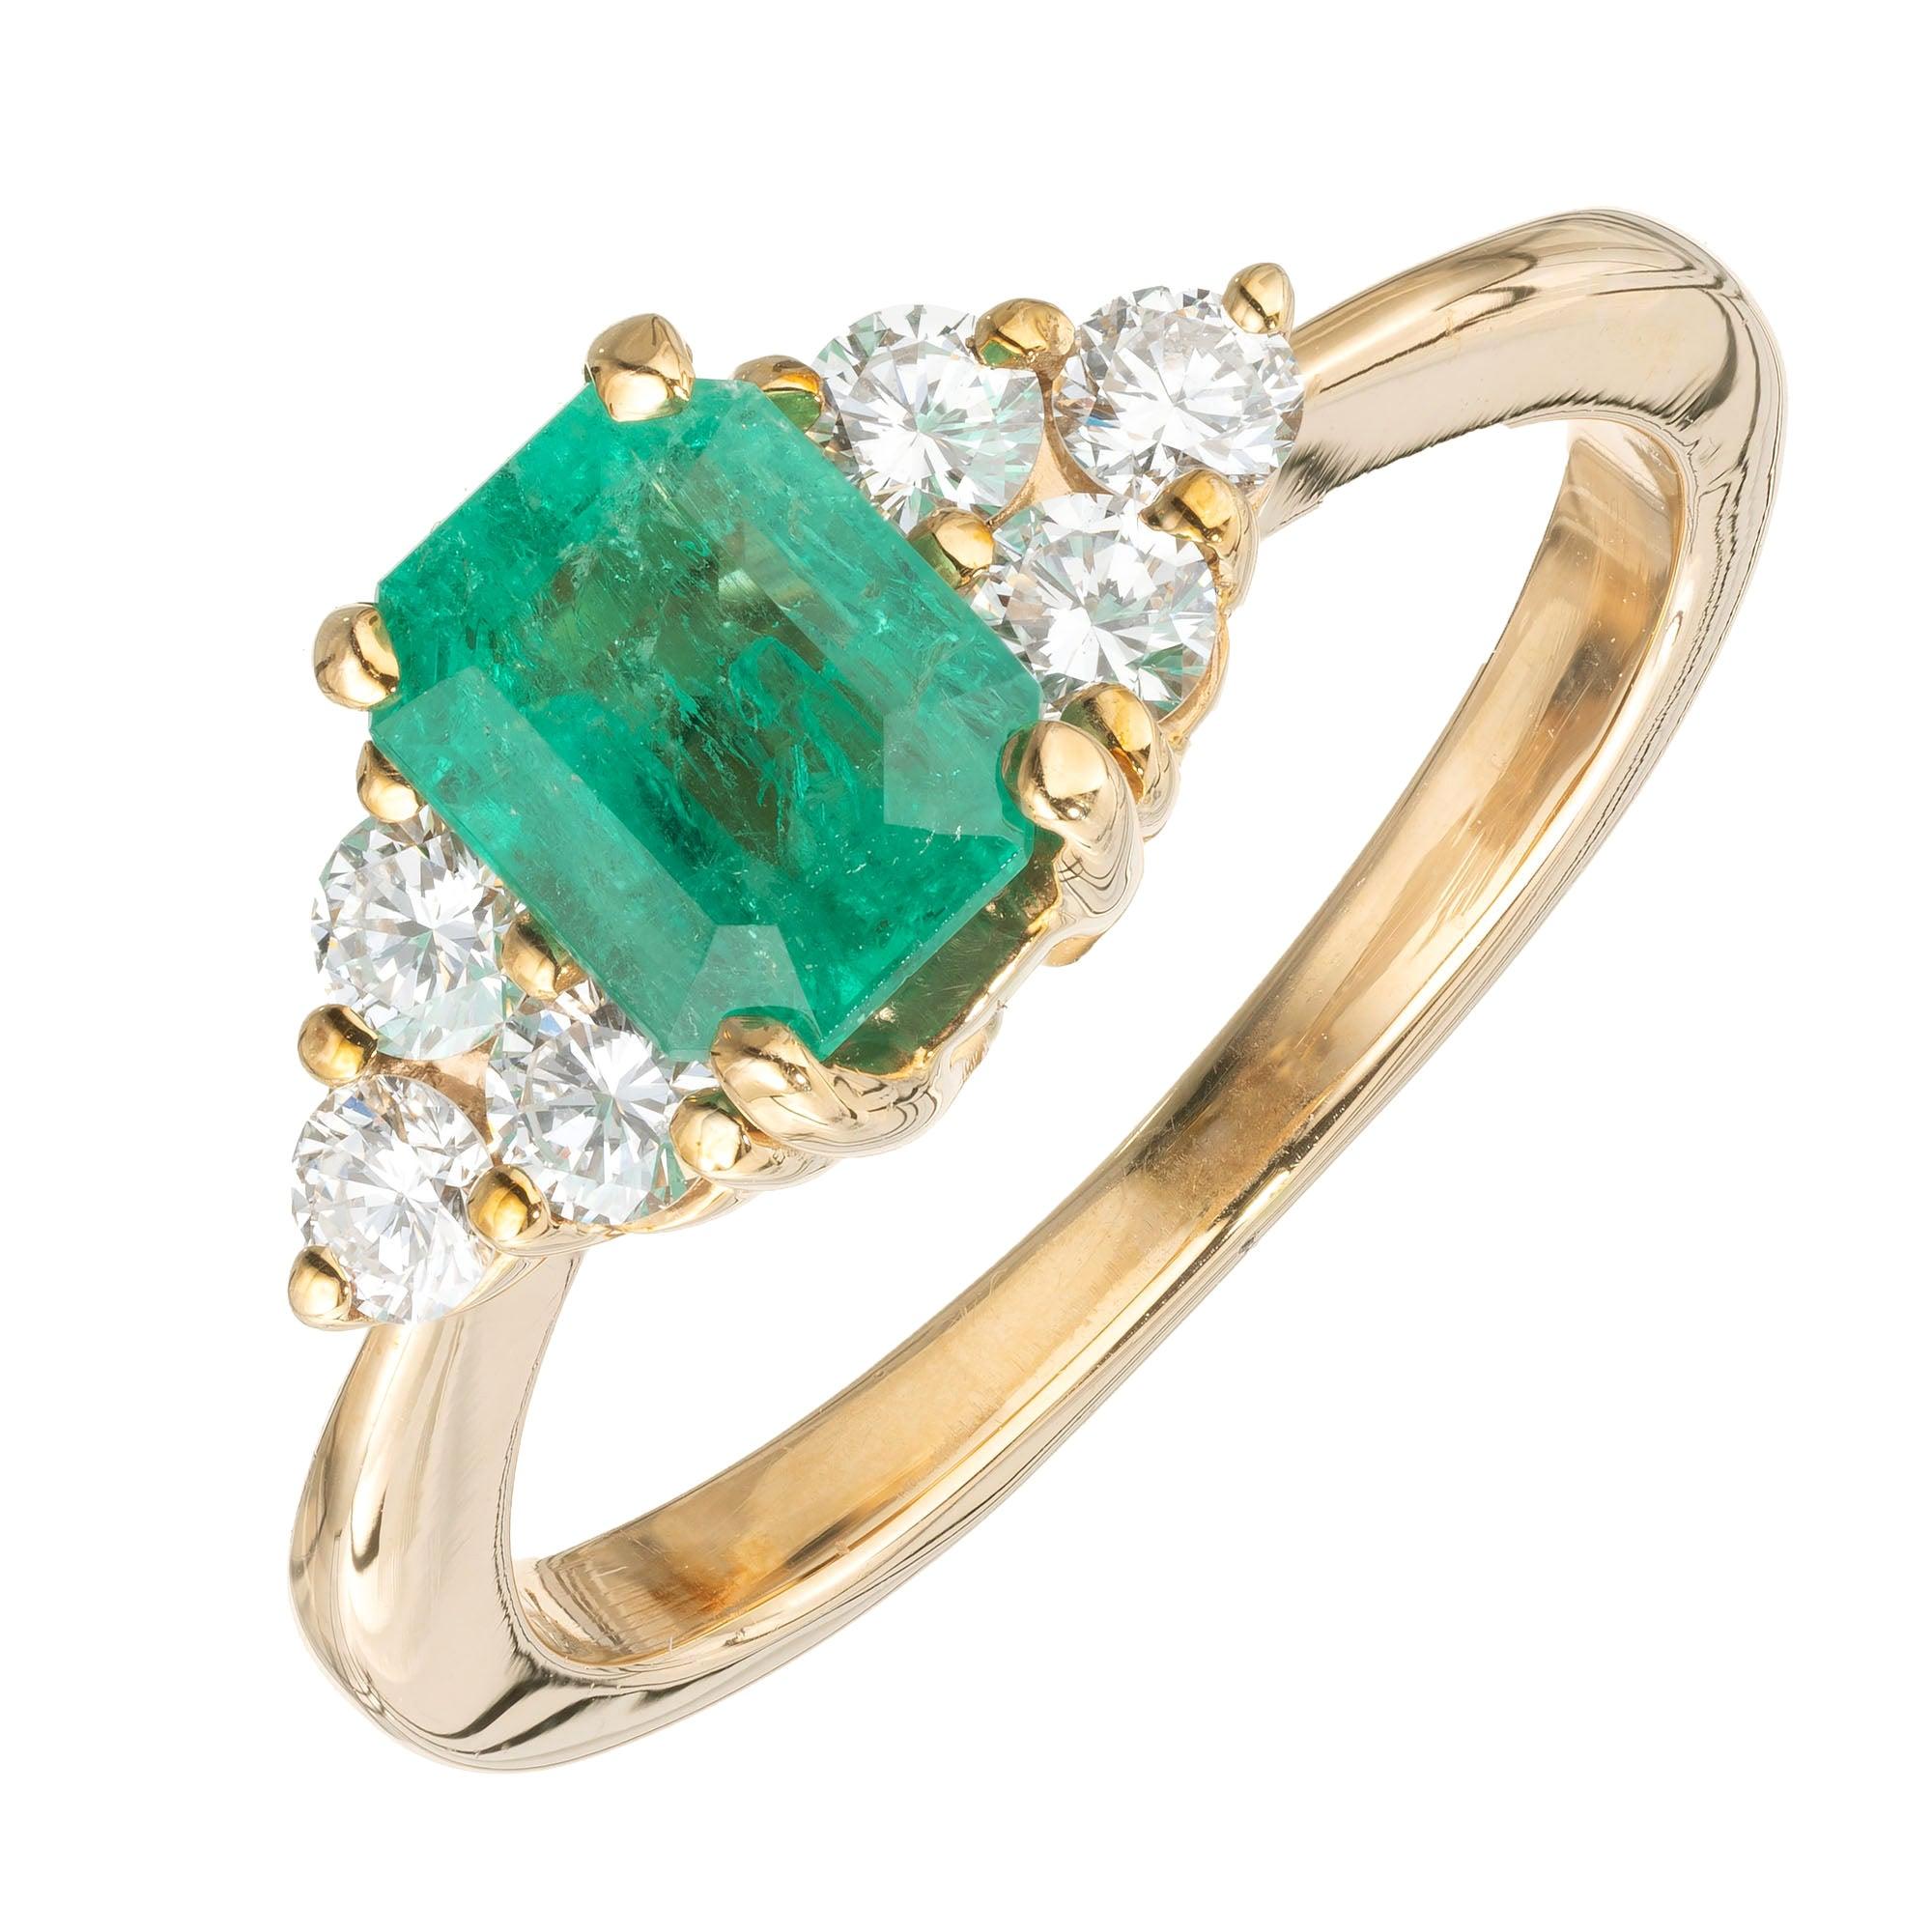 GIA Certified 1.09 Carat Emerald Diamond Yellow Gold Engagement Ring